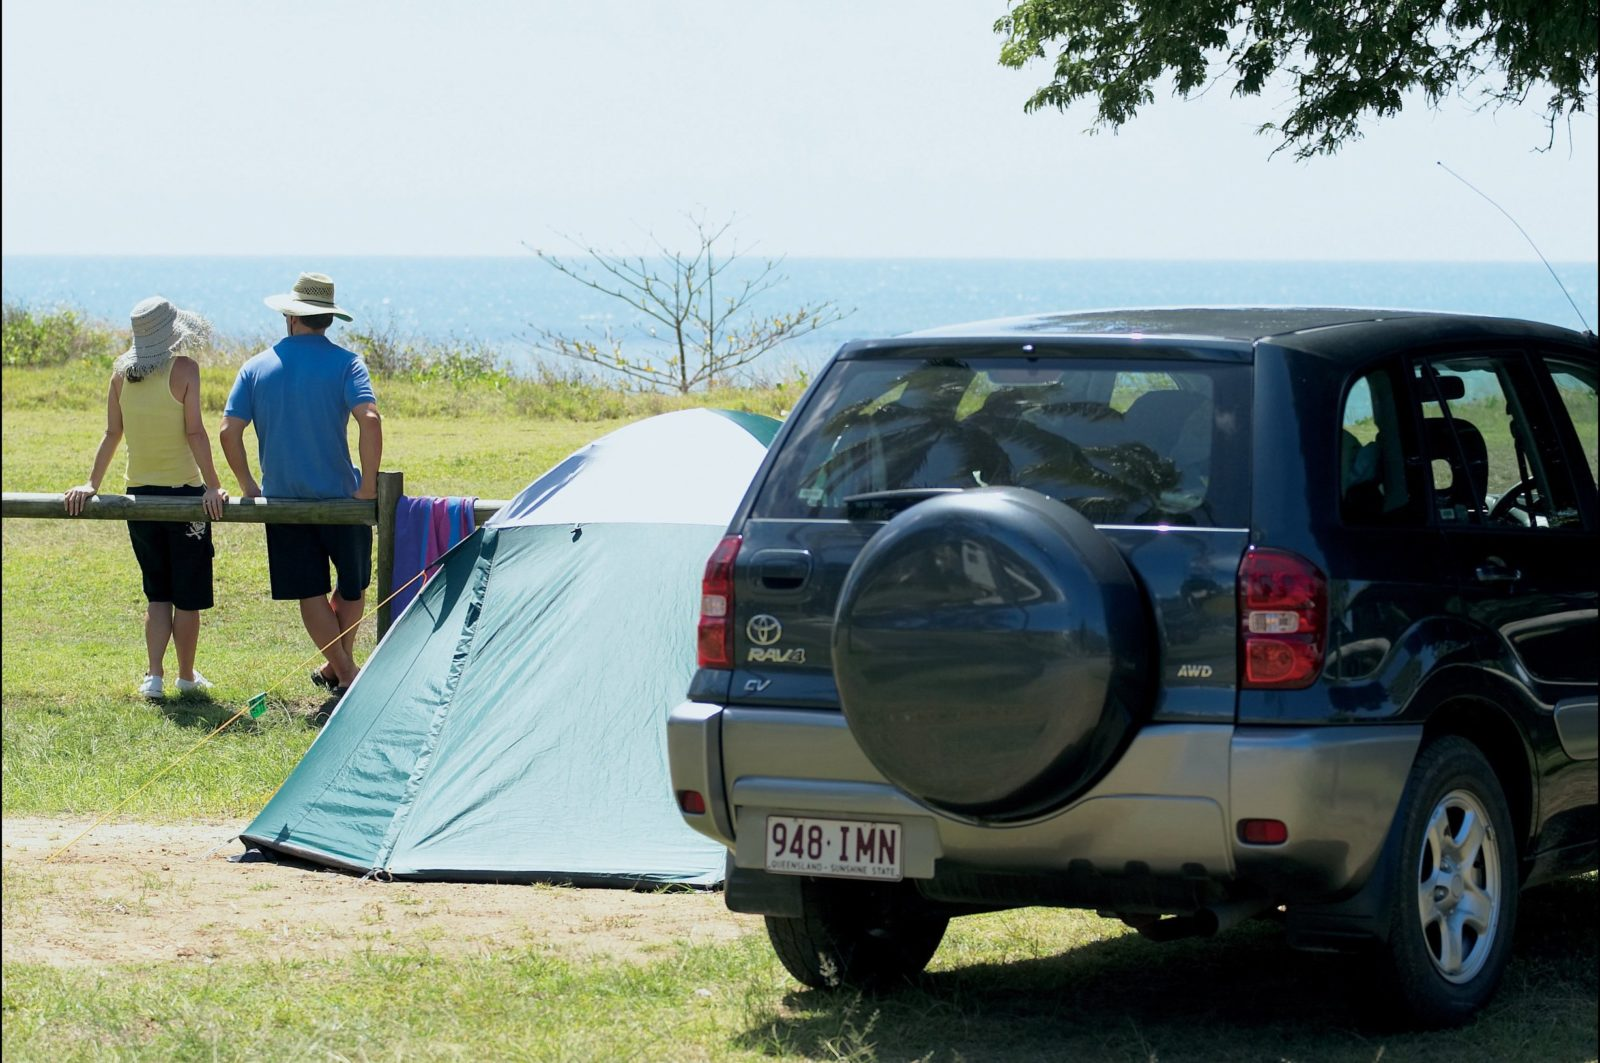 Sea forth Camping